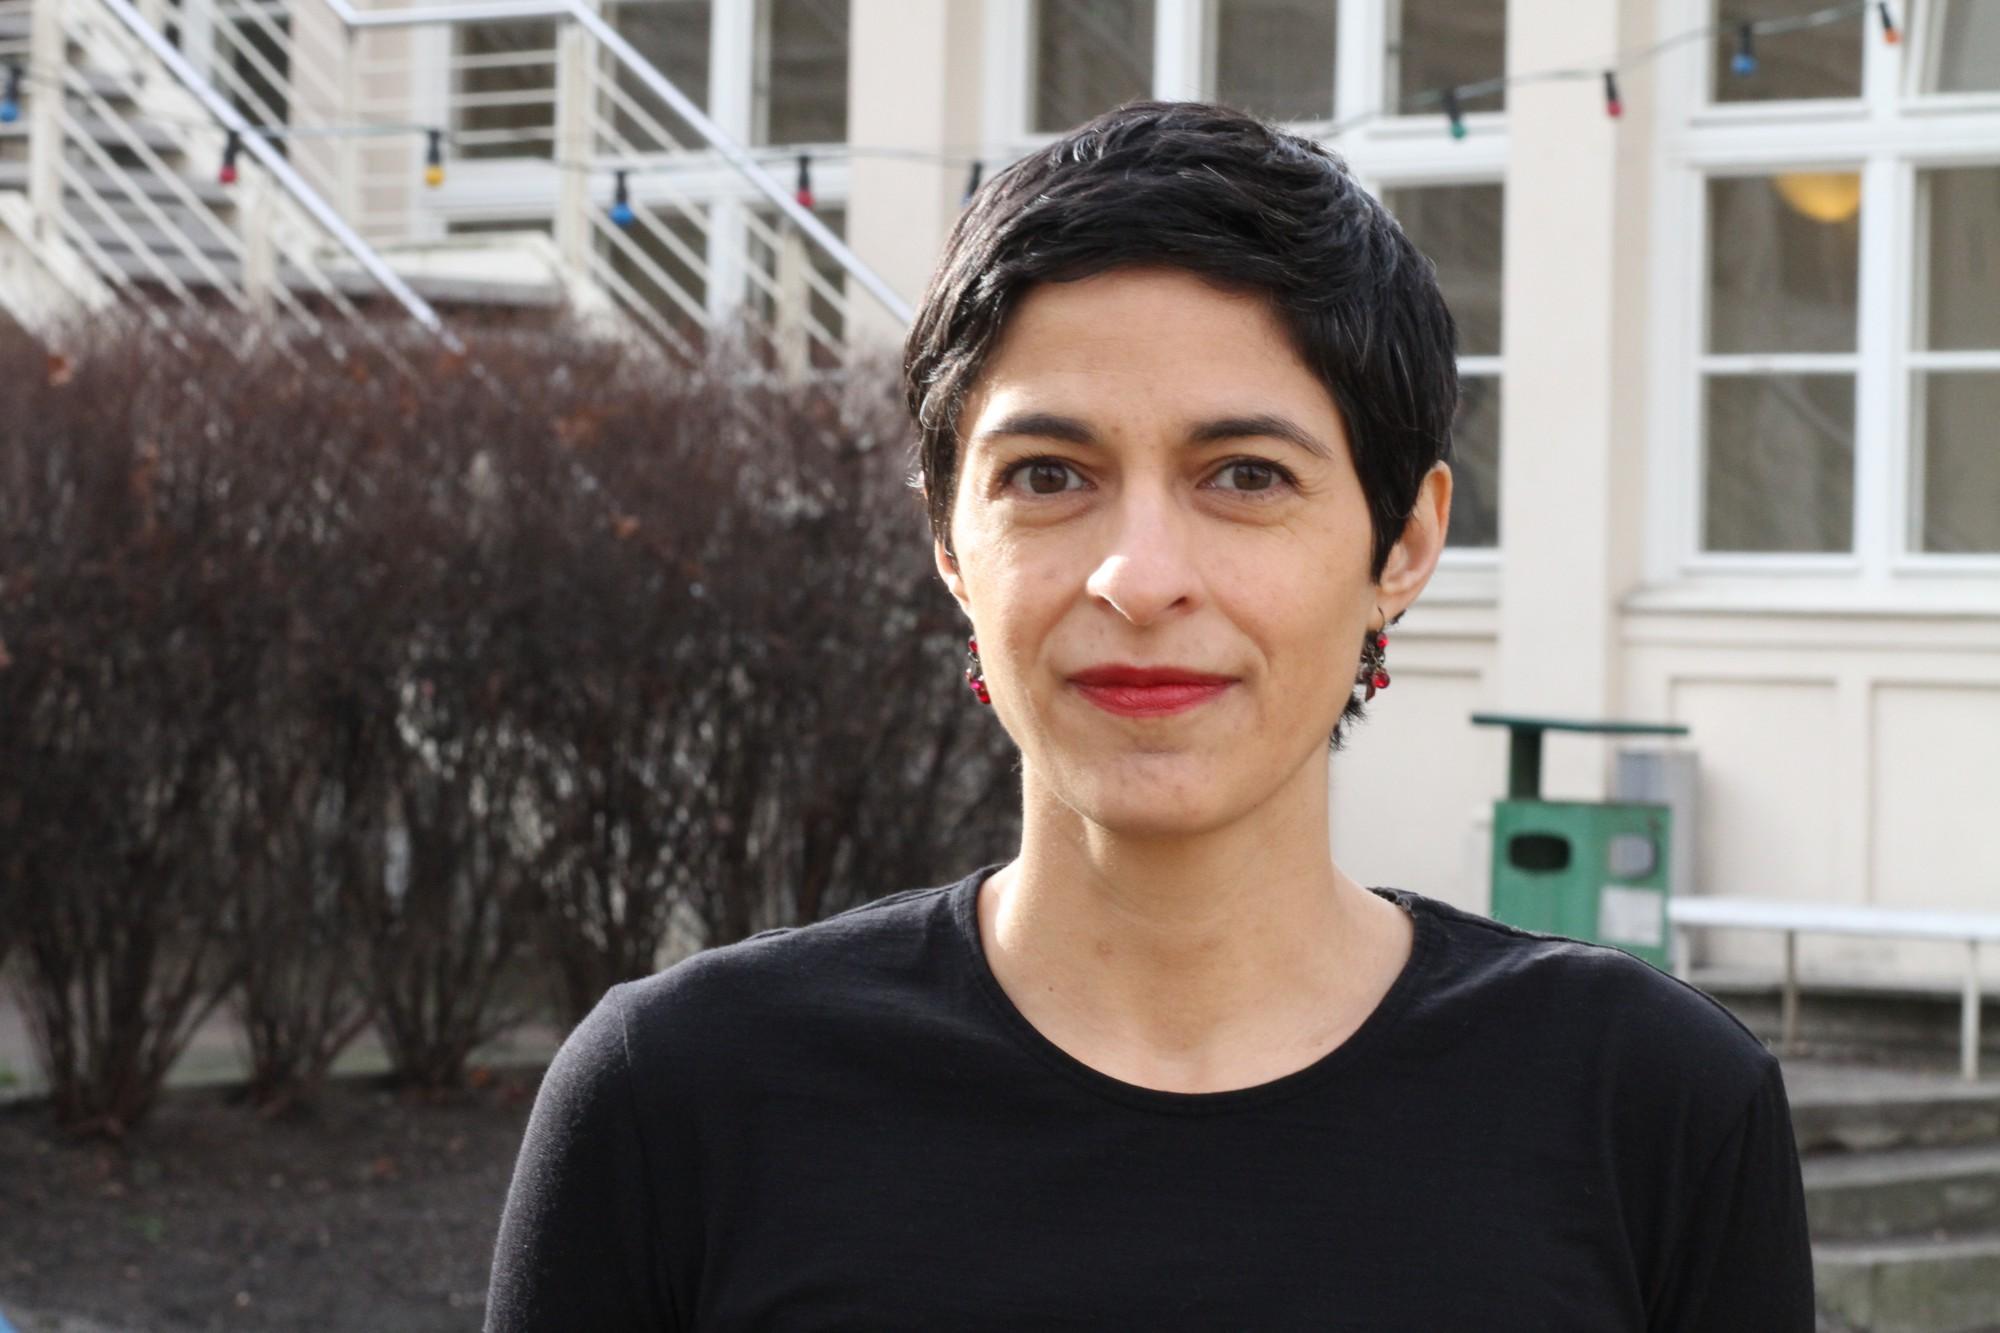 Xenia Sircar